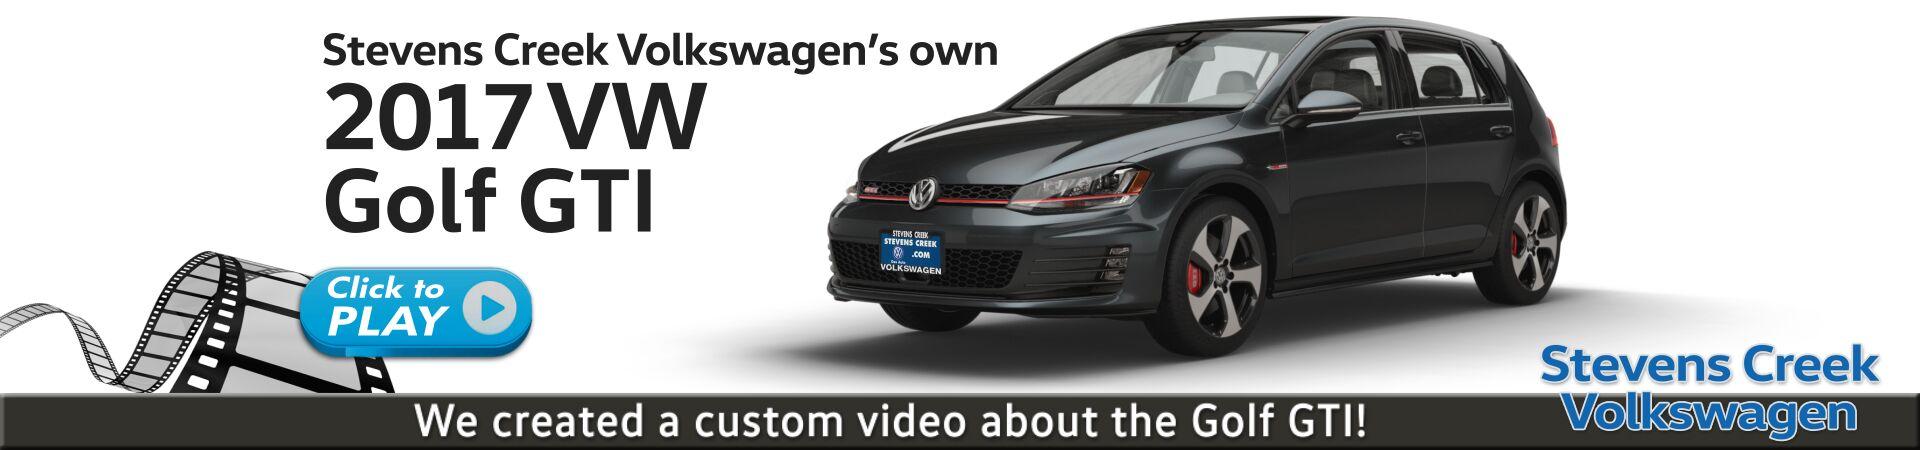 Volkswagen Dealership San Jose Ca Used Cars Stevens Creek Volkswagen